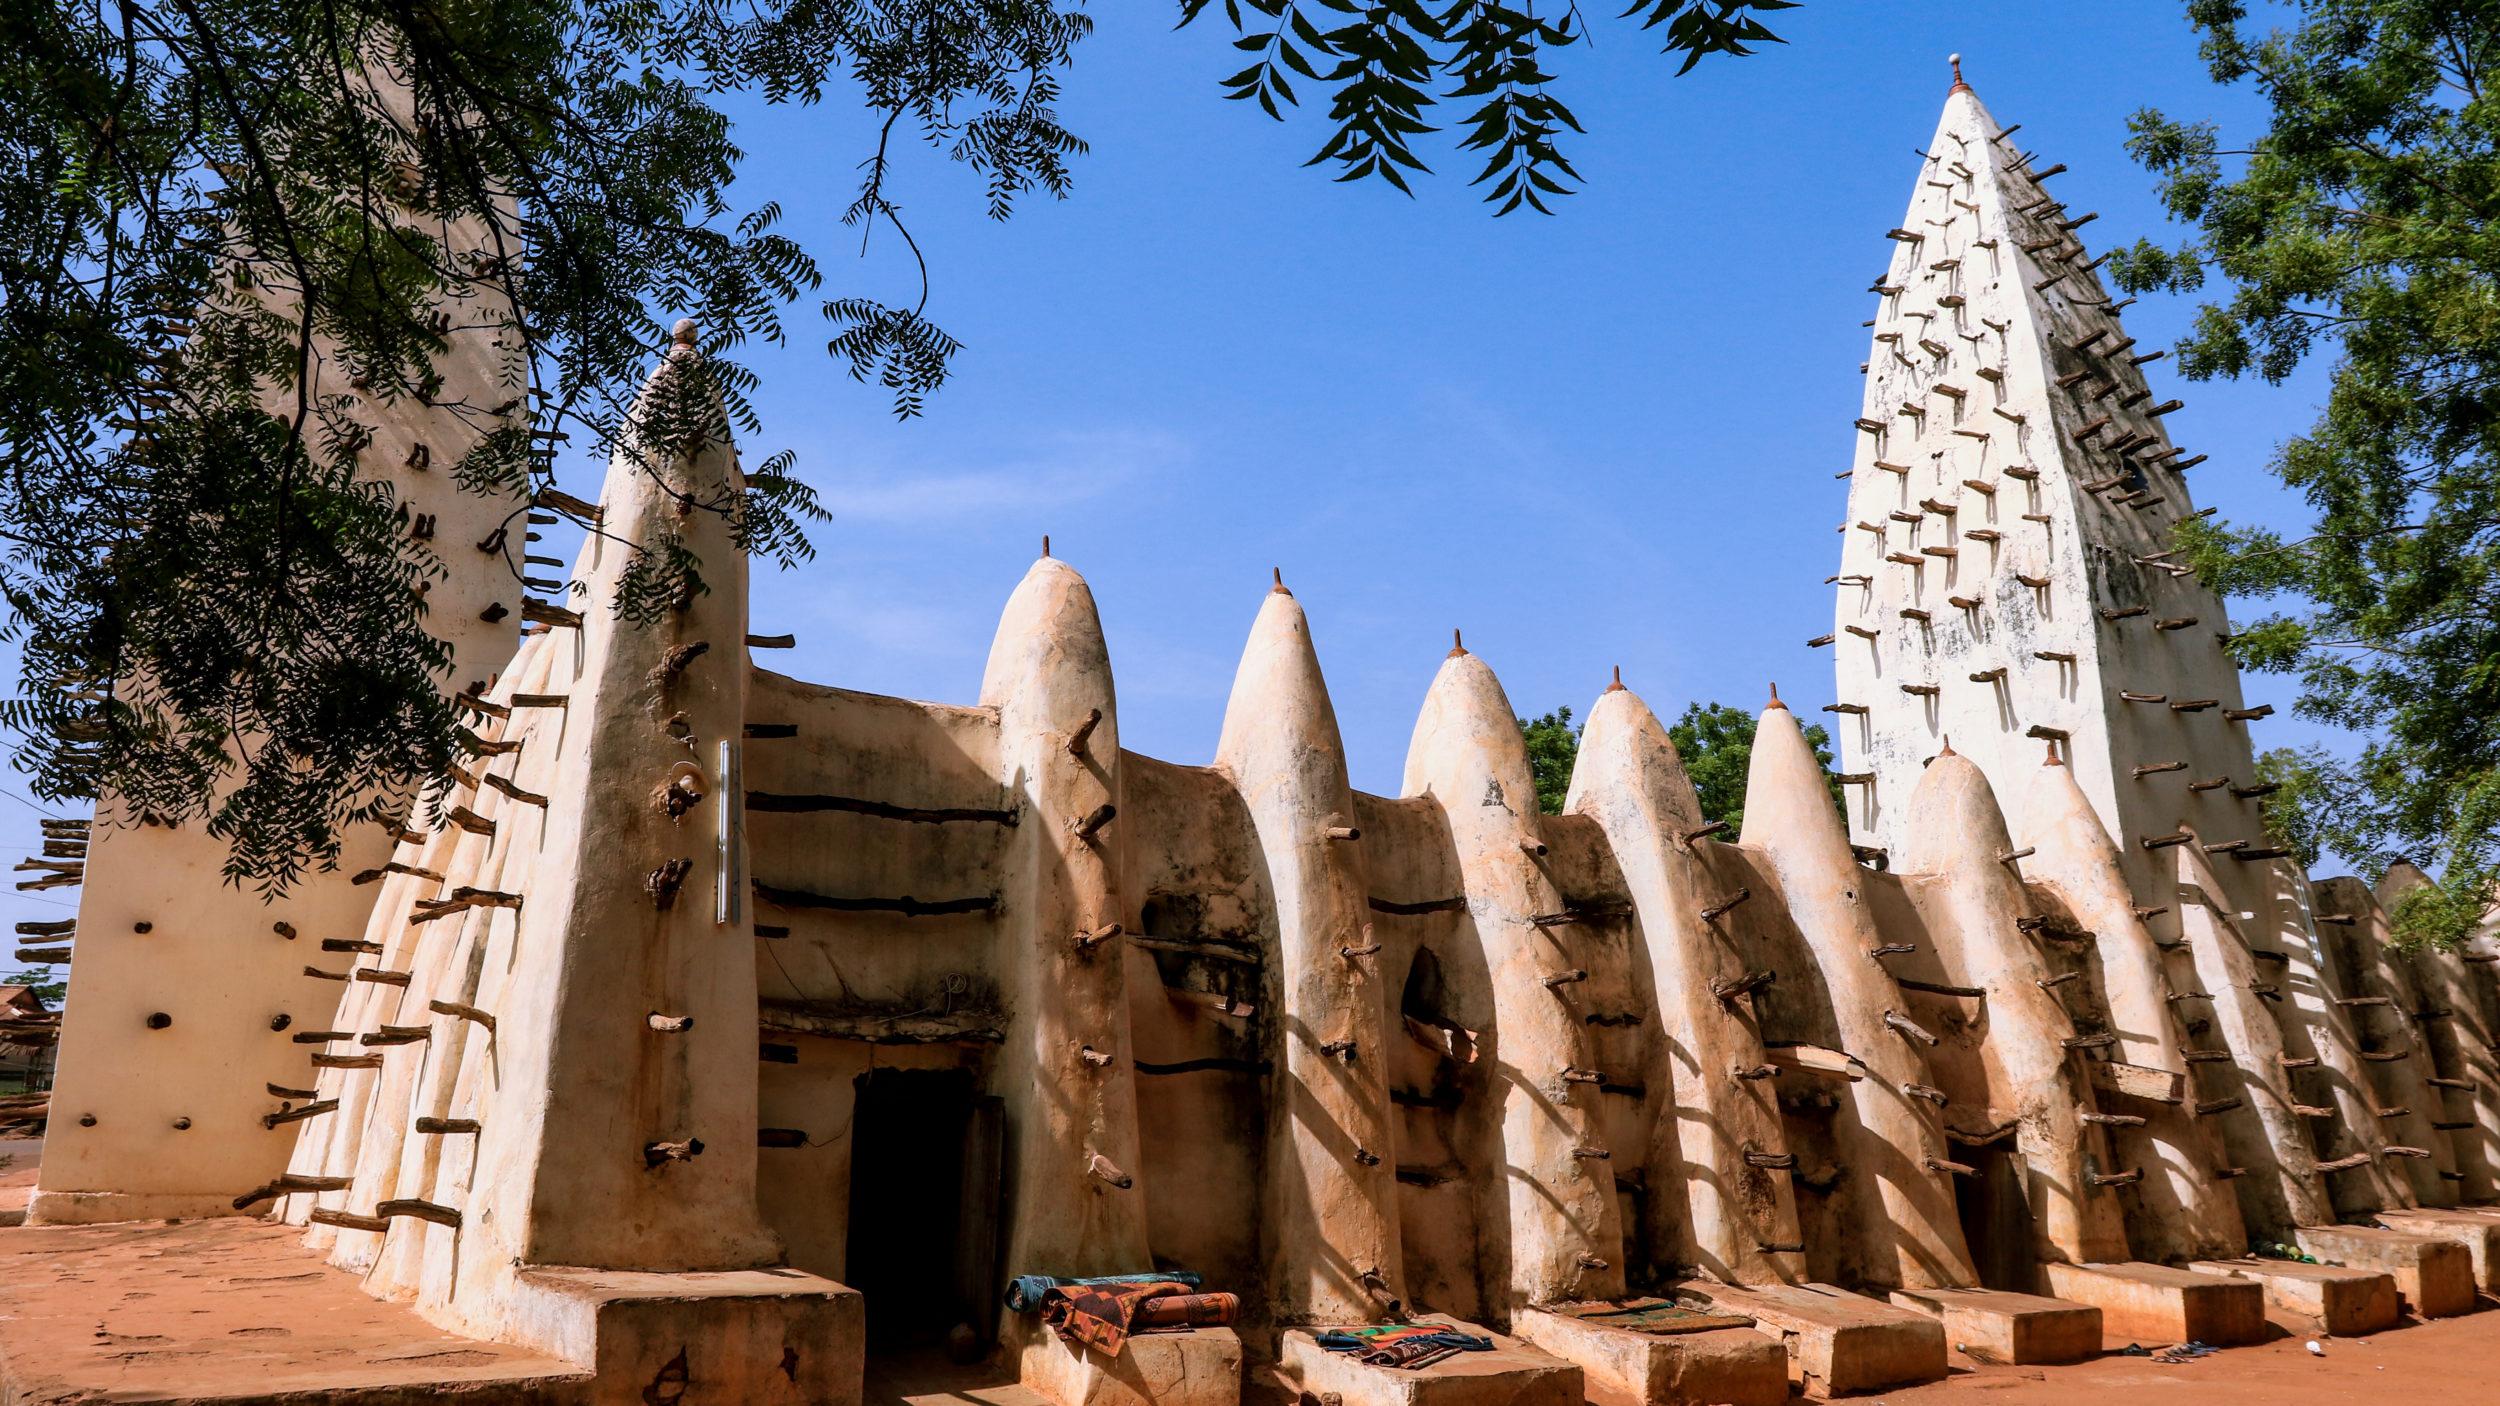 Burkina Faso [shutterstock]